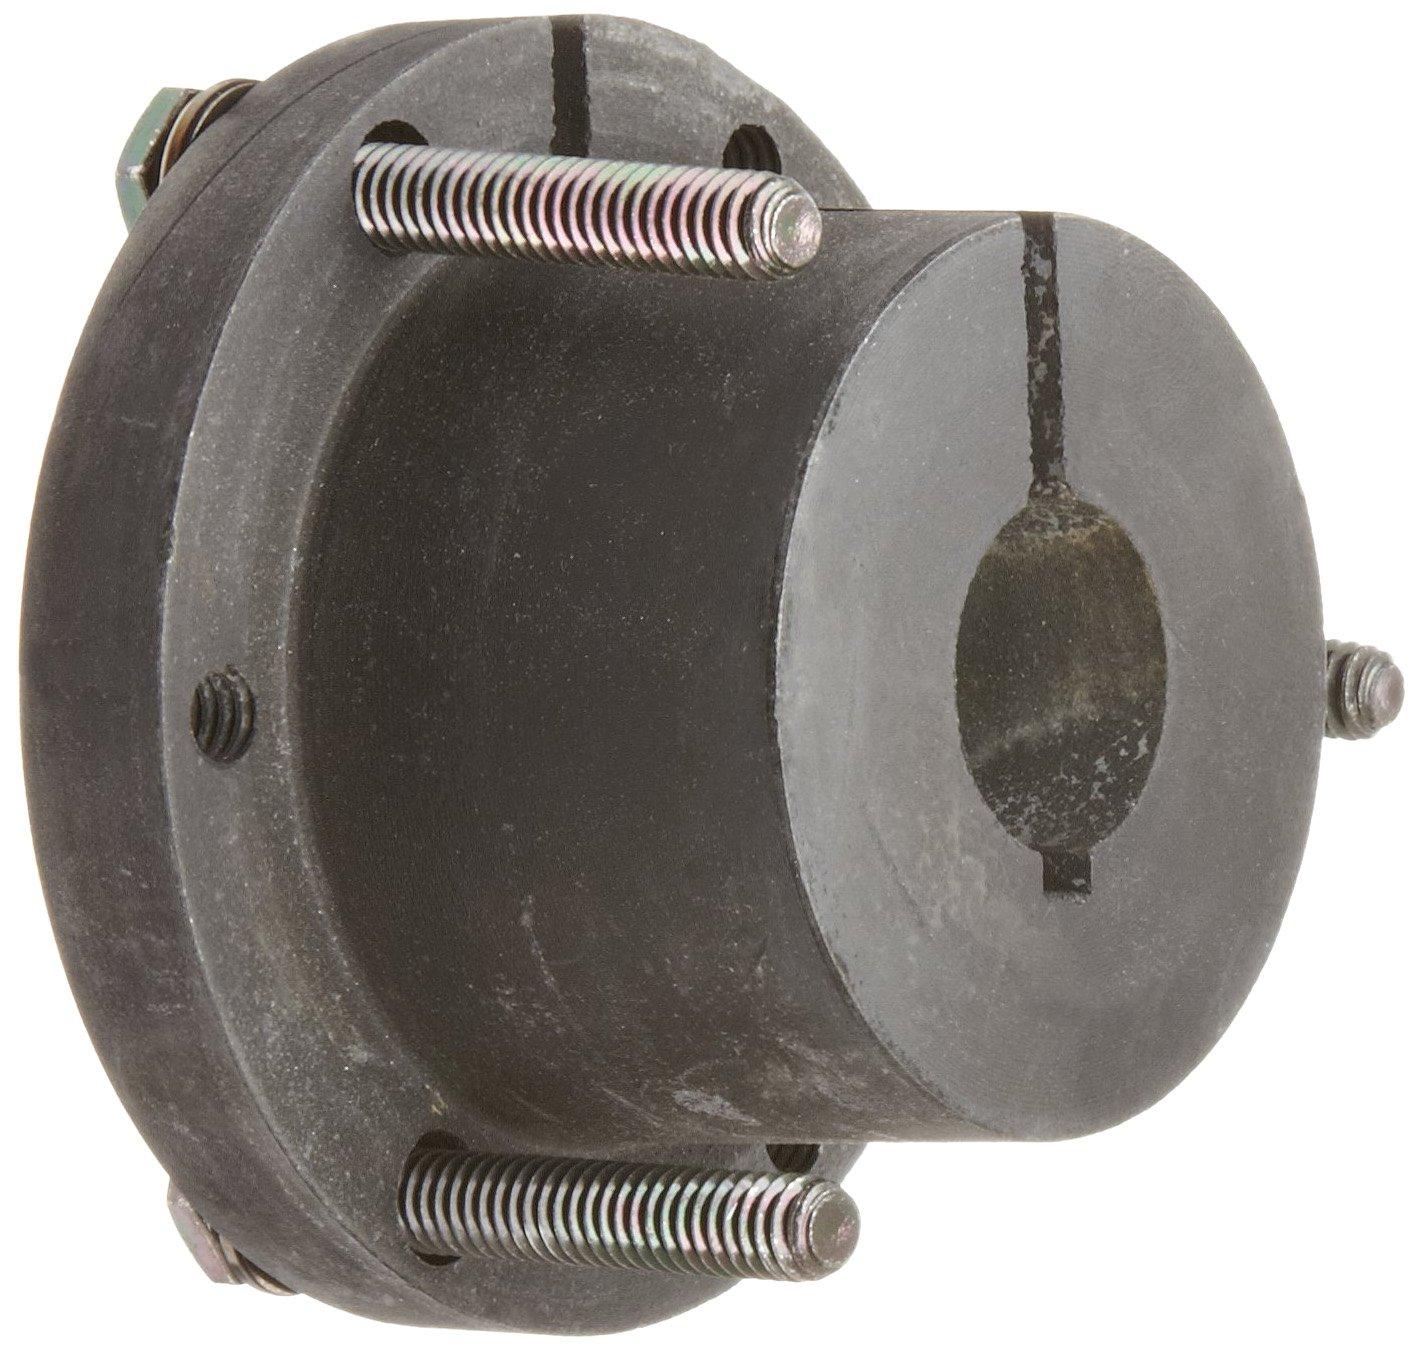 2.187 OD 0.87 Bore Martin SD 7//8 Quick Disconnect Bushing Class 30 Gray Cast Iron 1.81 Length Inch